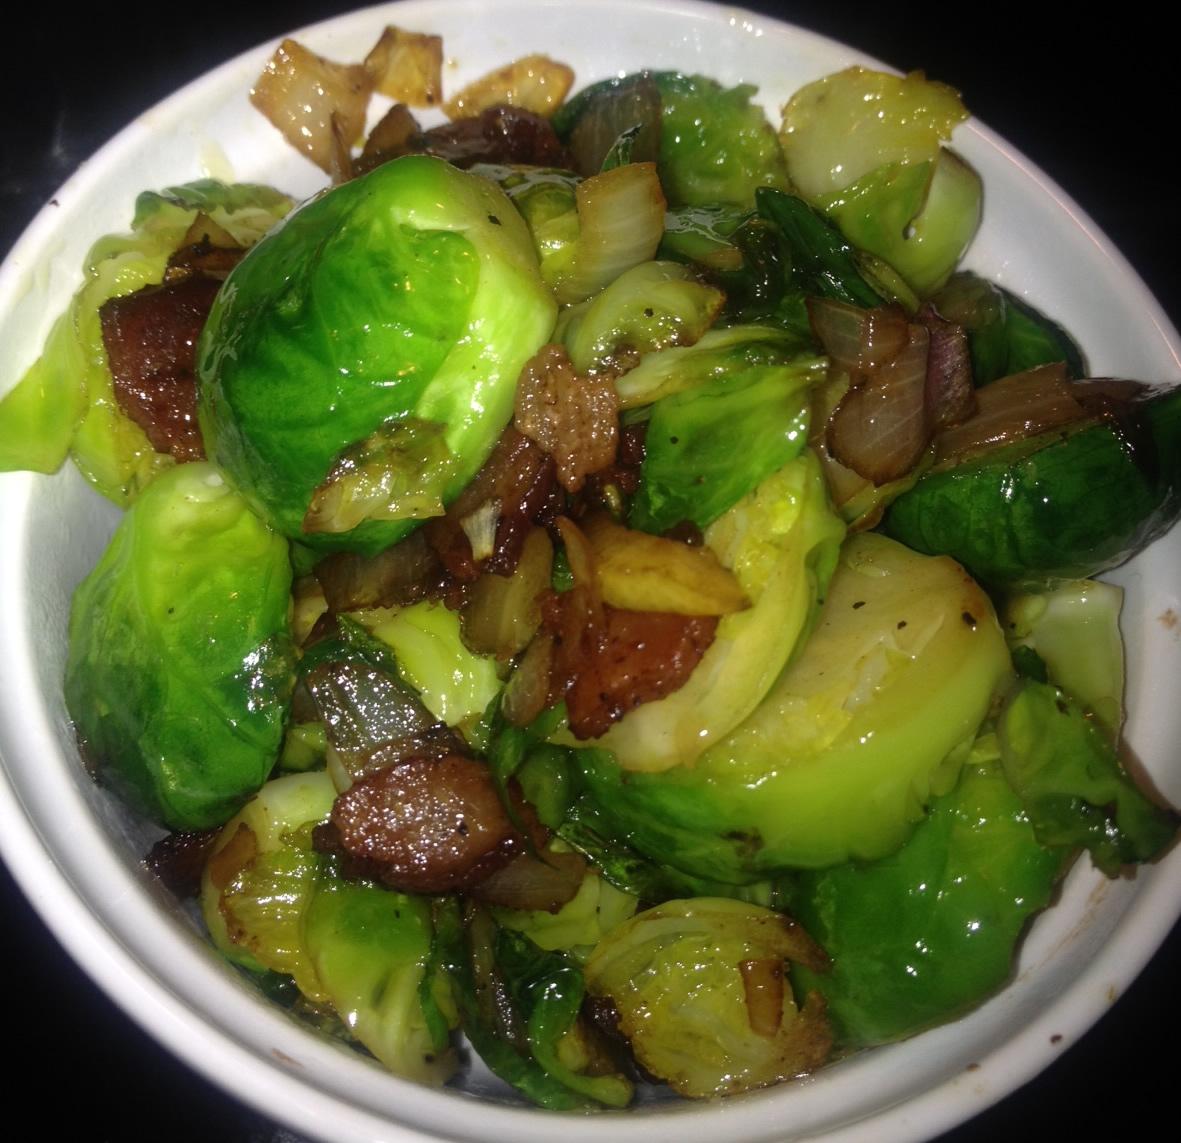 Brussel sprouts with baconla cuisine minuscule for Cuisine minuscule